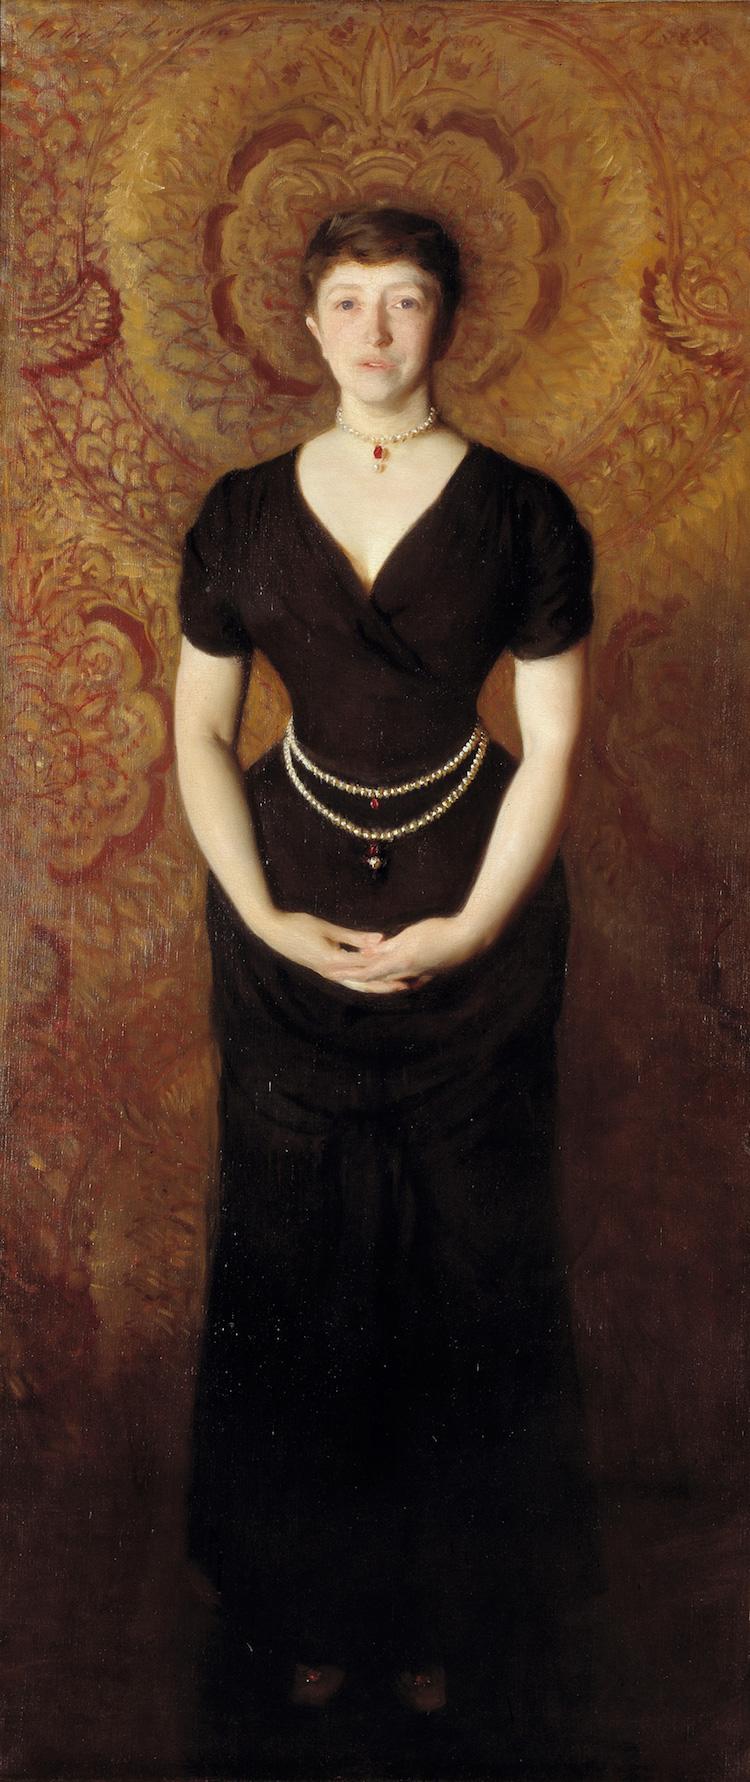 Isabella Stewart Gardner by John Singer Sargent